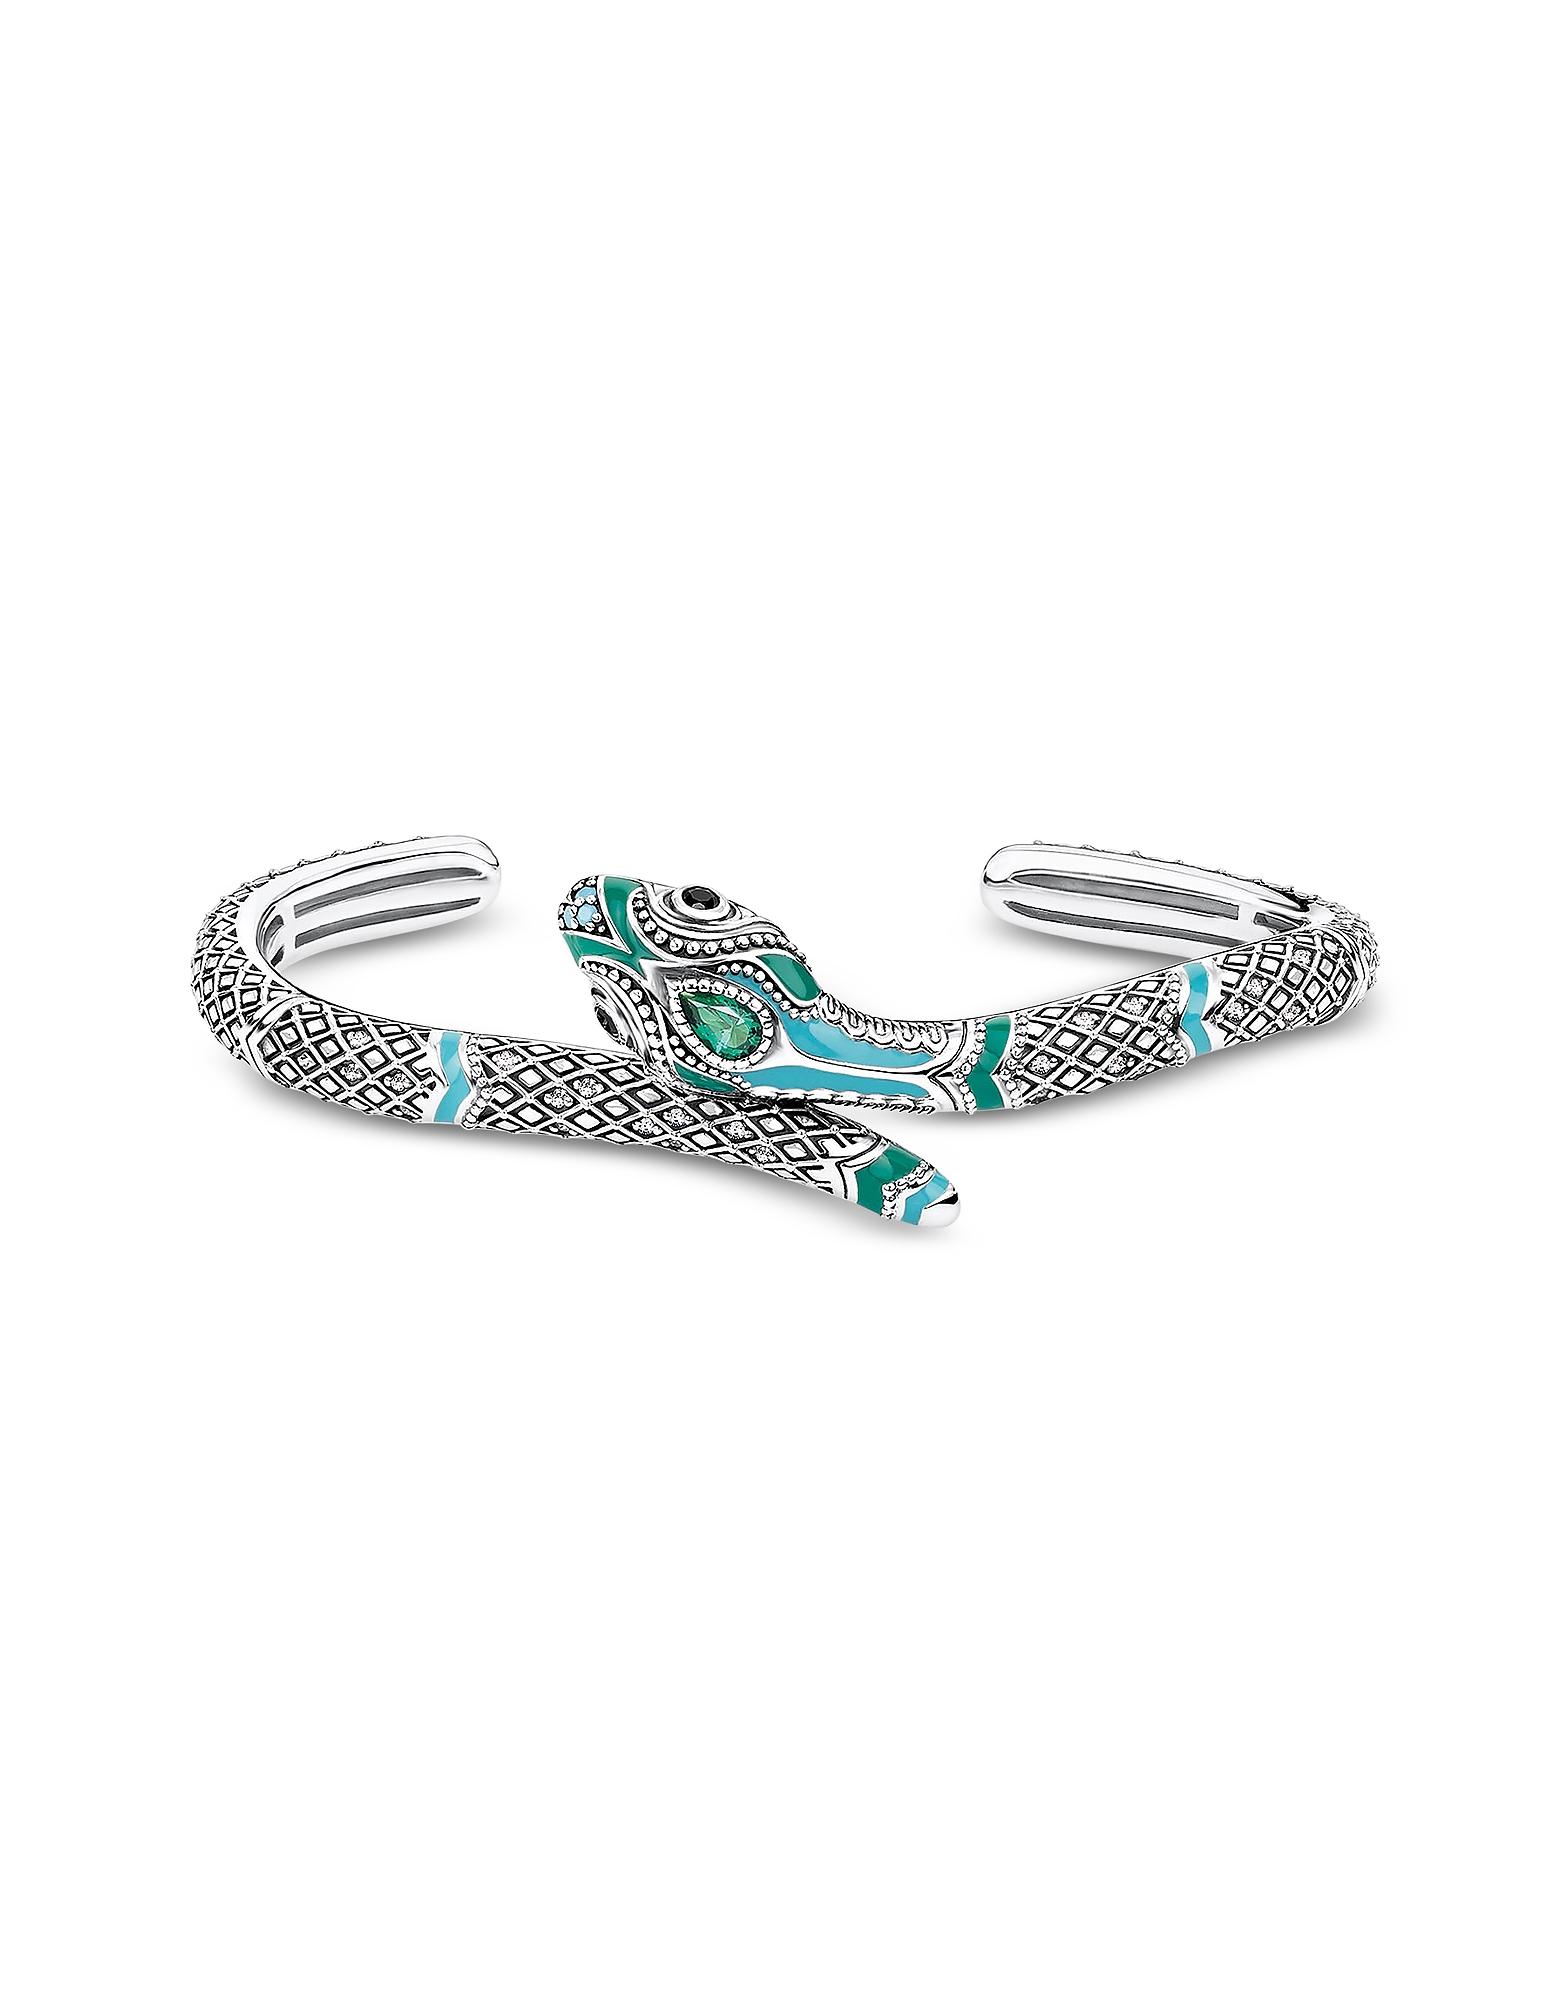 Thomas Sabo Bracelets, Blackened Sterling Silver, Enamel and Glass-ceramic Stones Snake Bangle